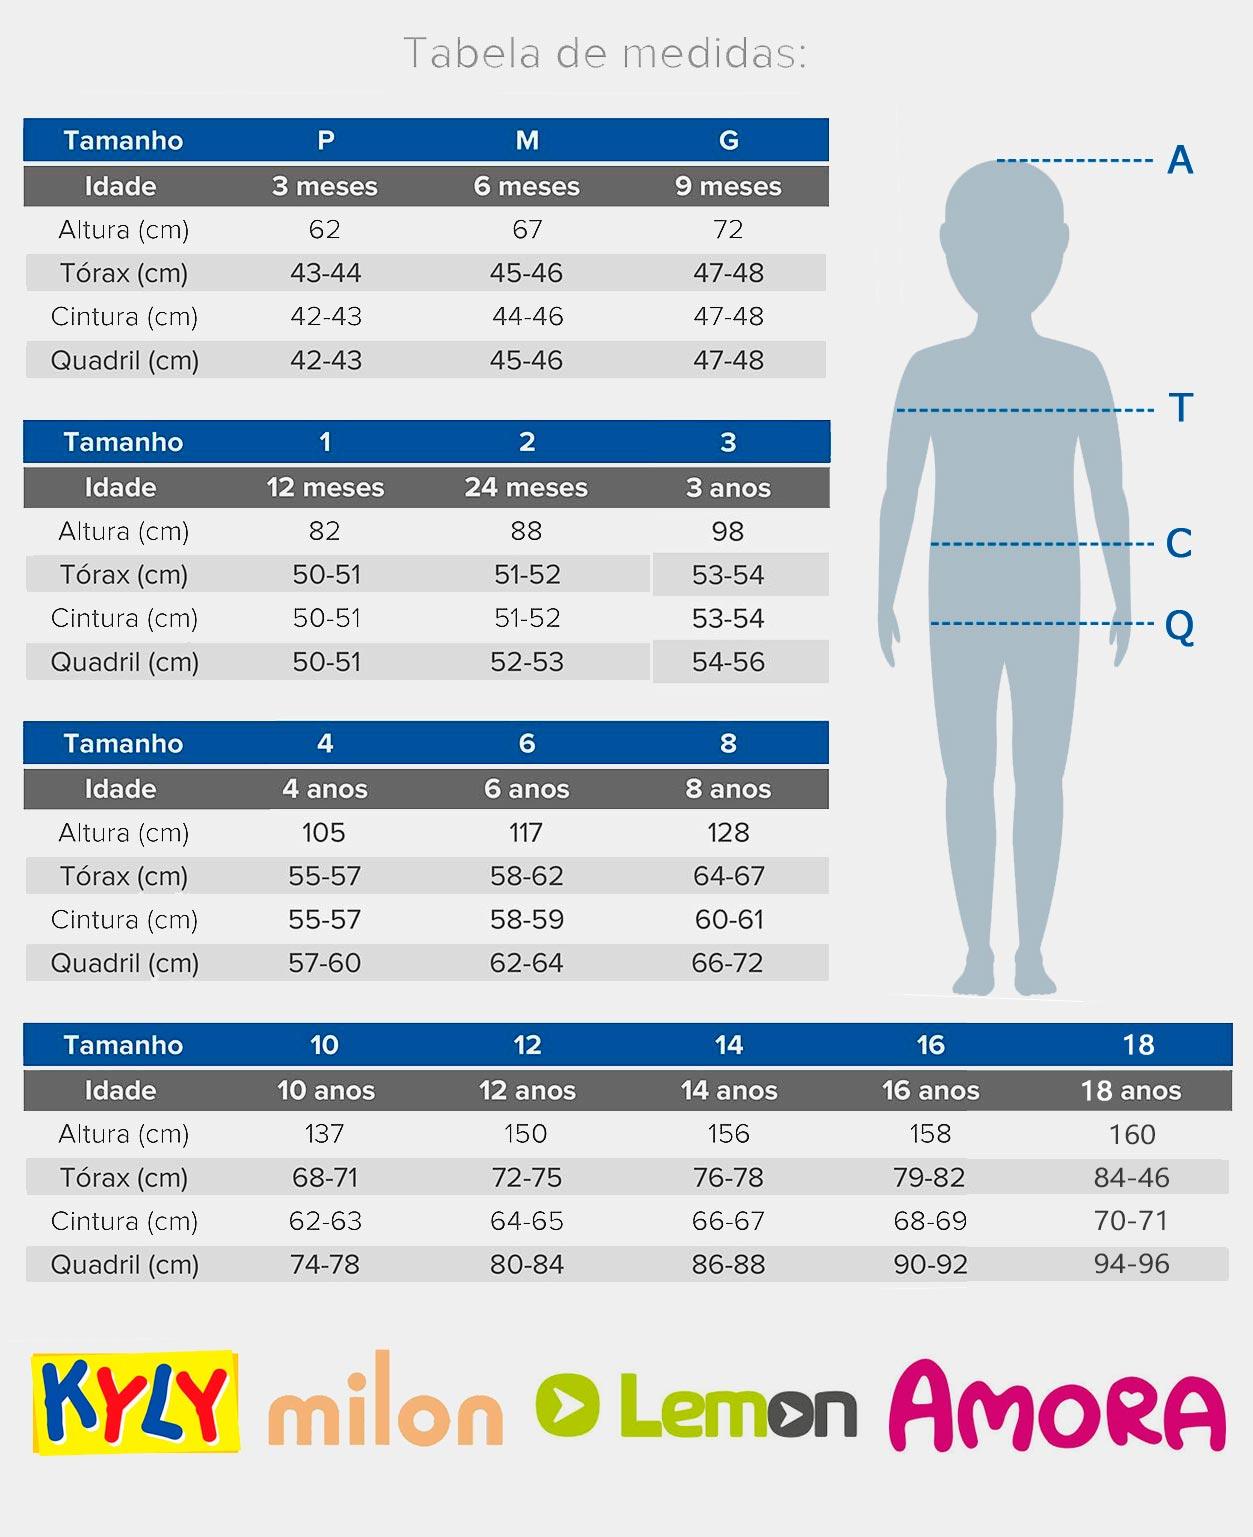 Vestido Infantil Curto Vermelho Margaridas - Kyly: Tabela de medidas